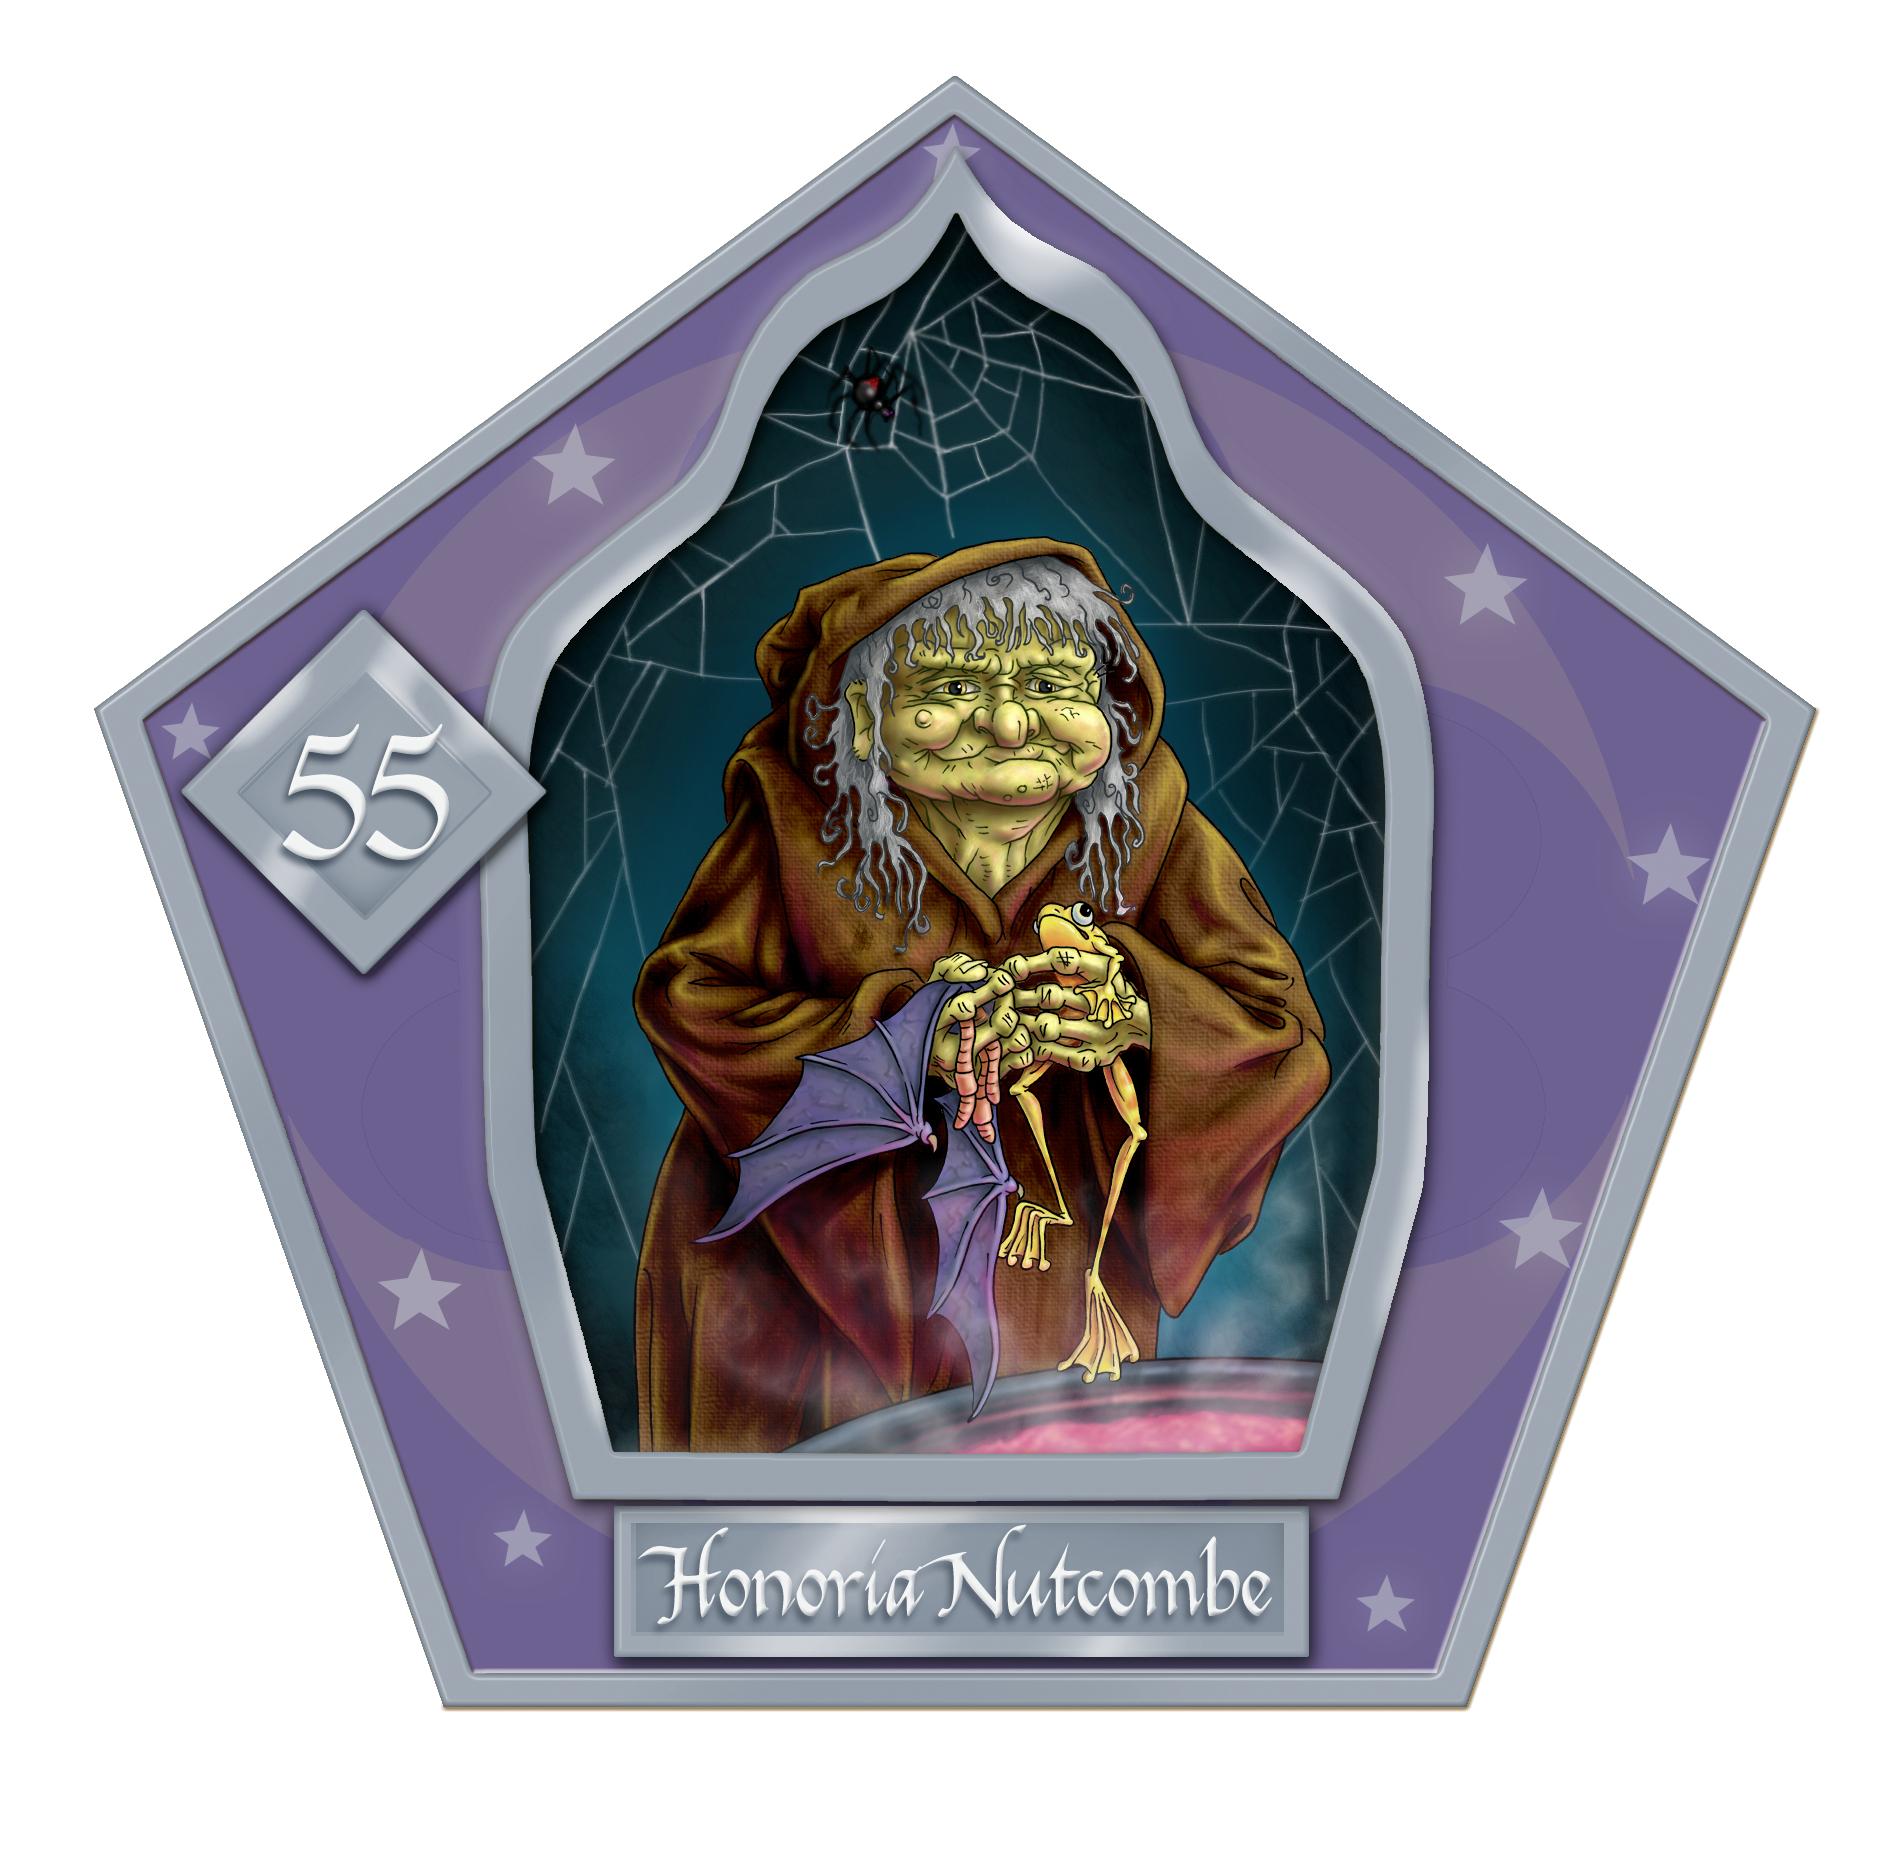 File:Honoria Nutcombe-55-chocFrogCard.png